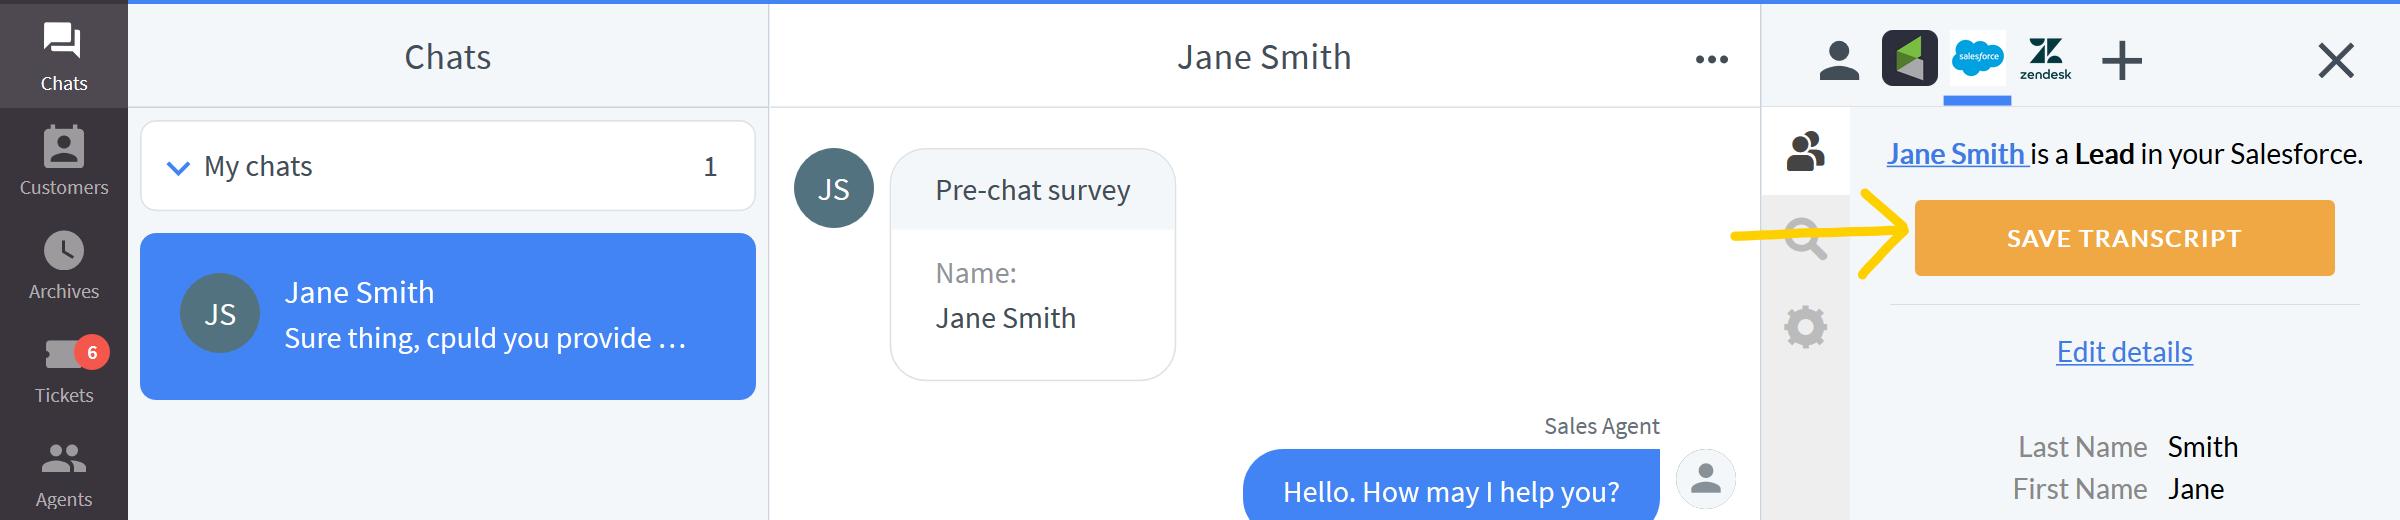 Saving a chat transcript